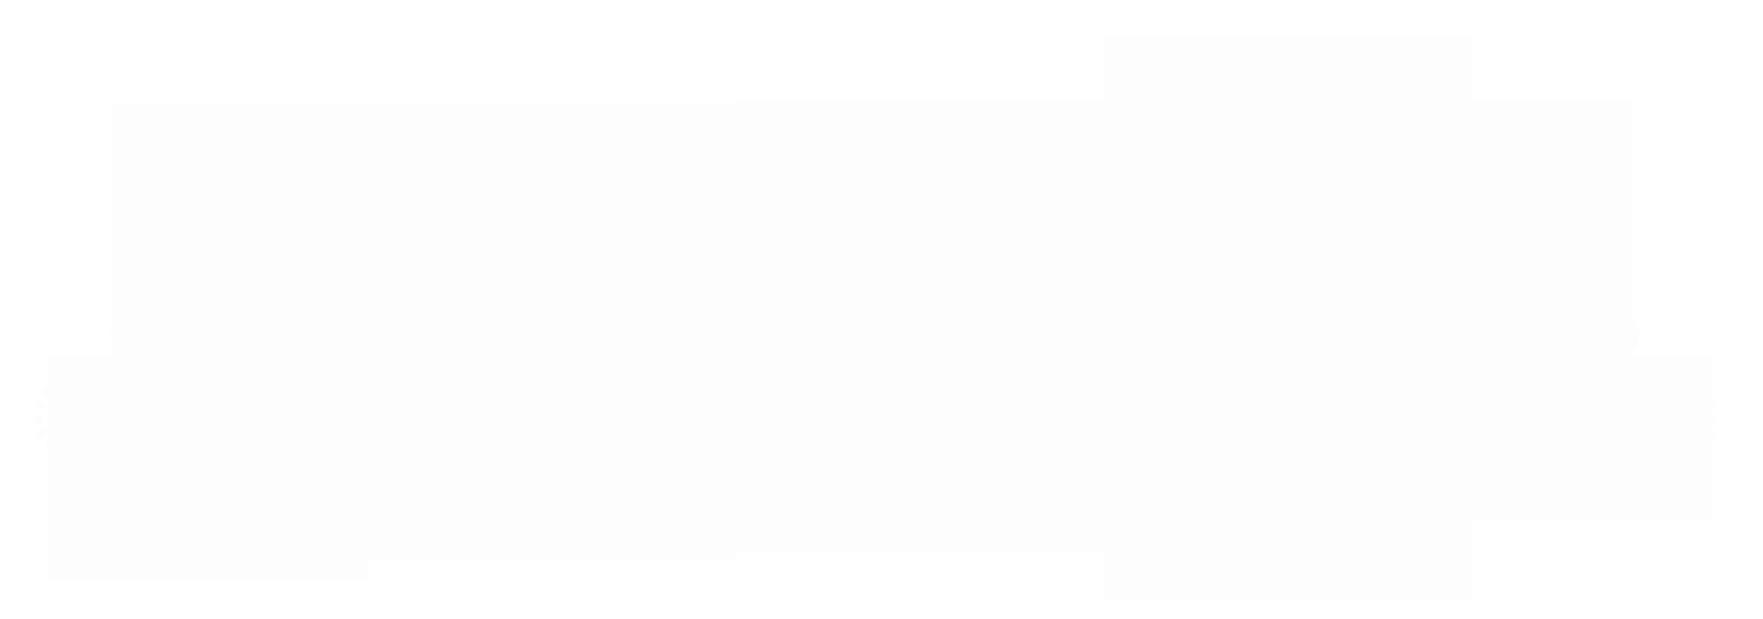 APRIL SPAULDING PHOTOGRAPHY